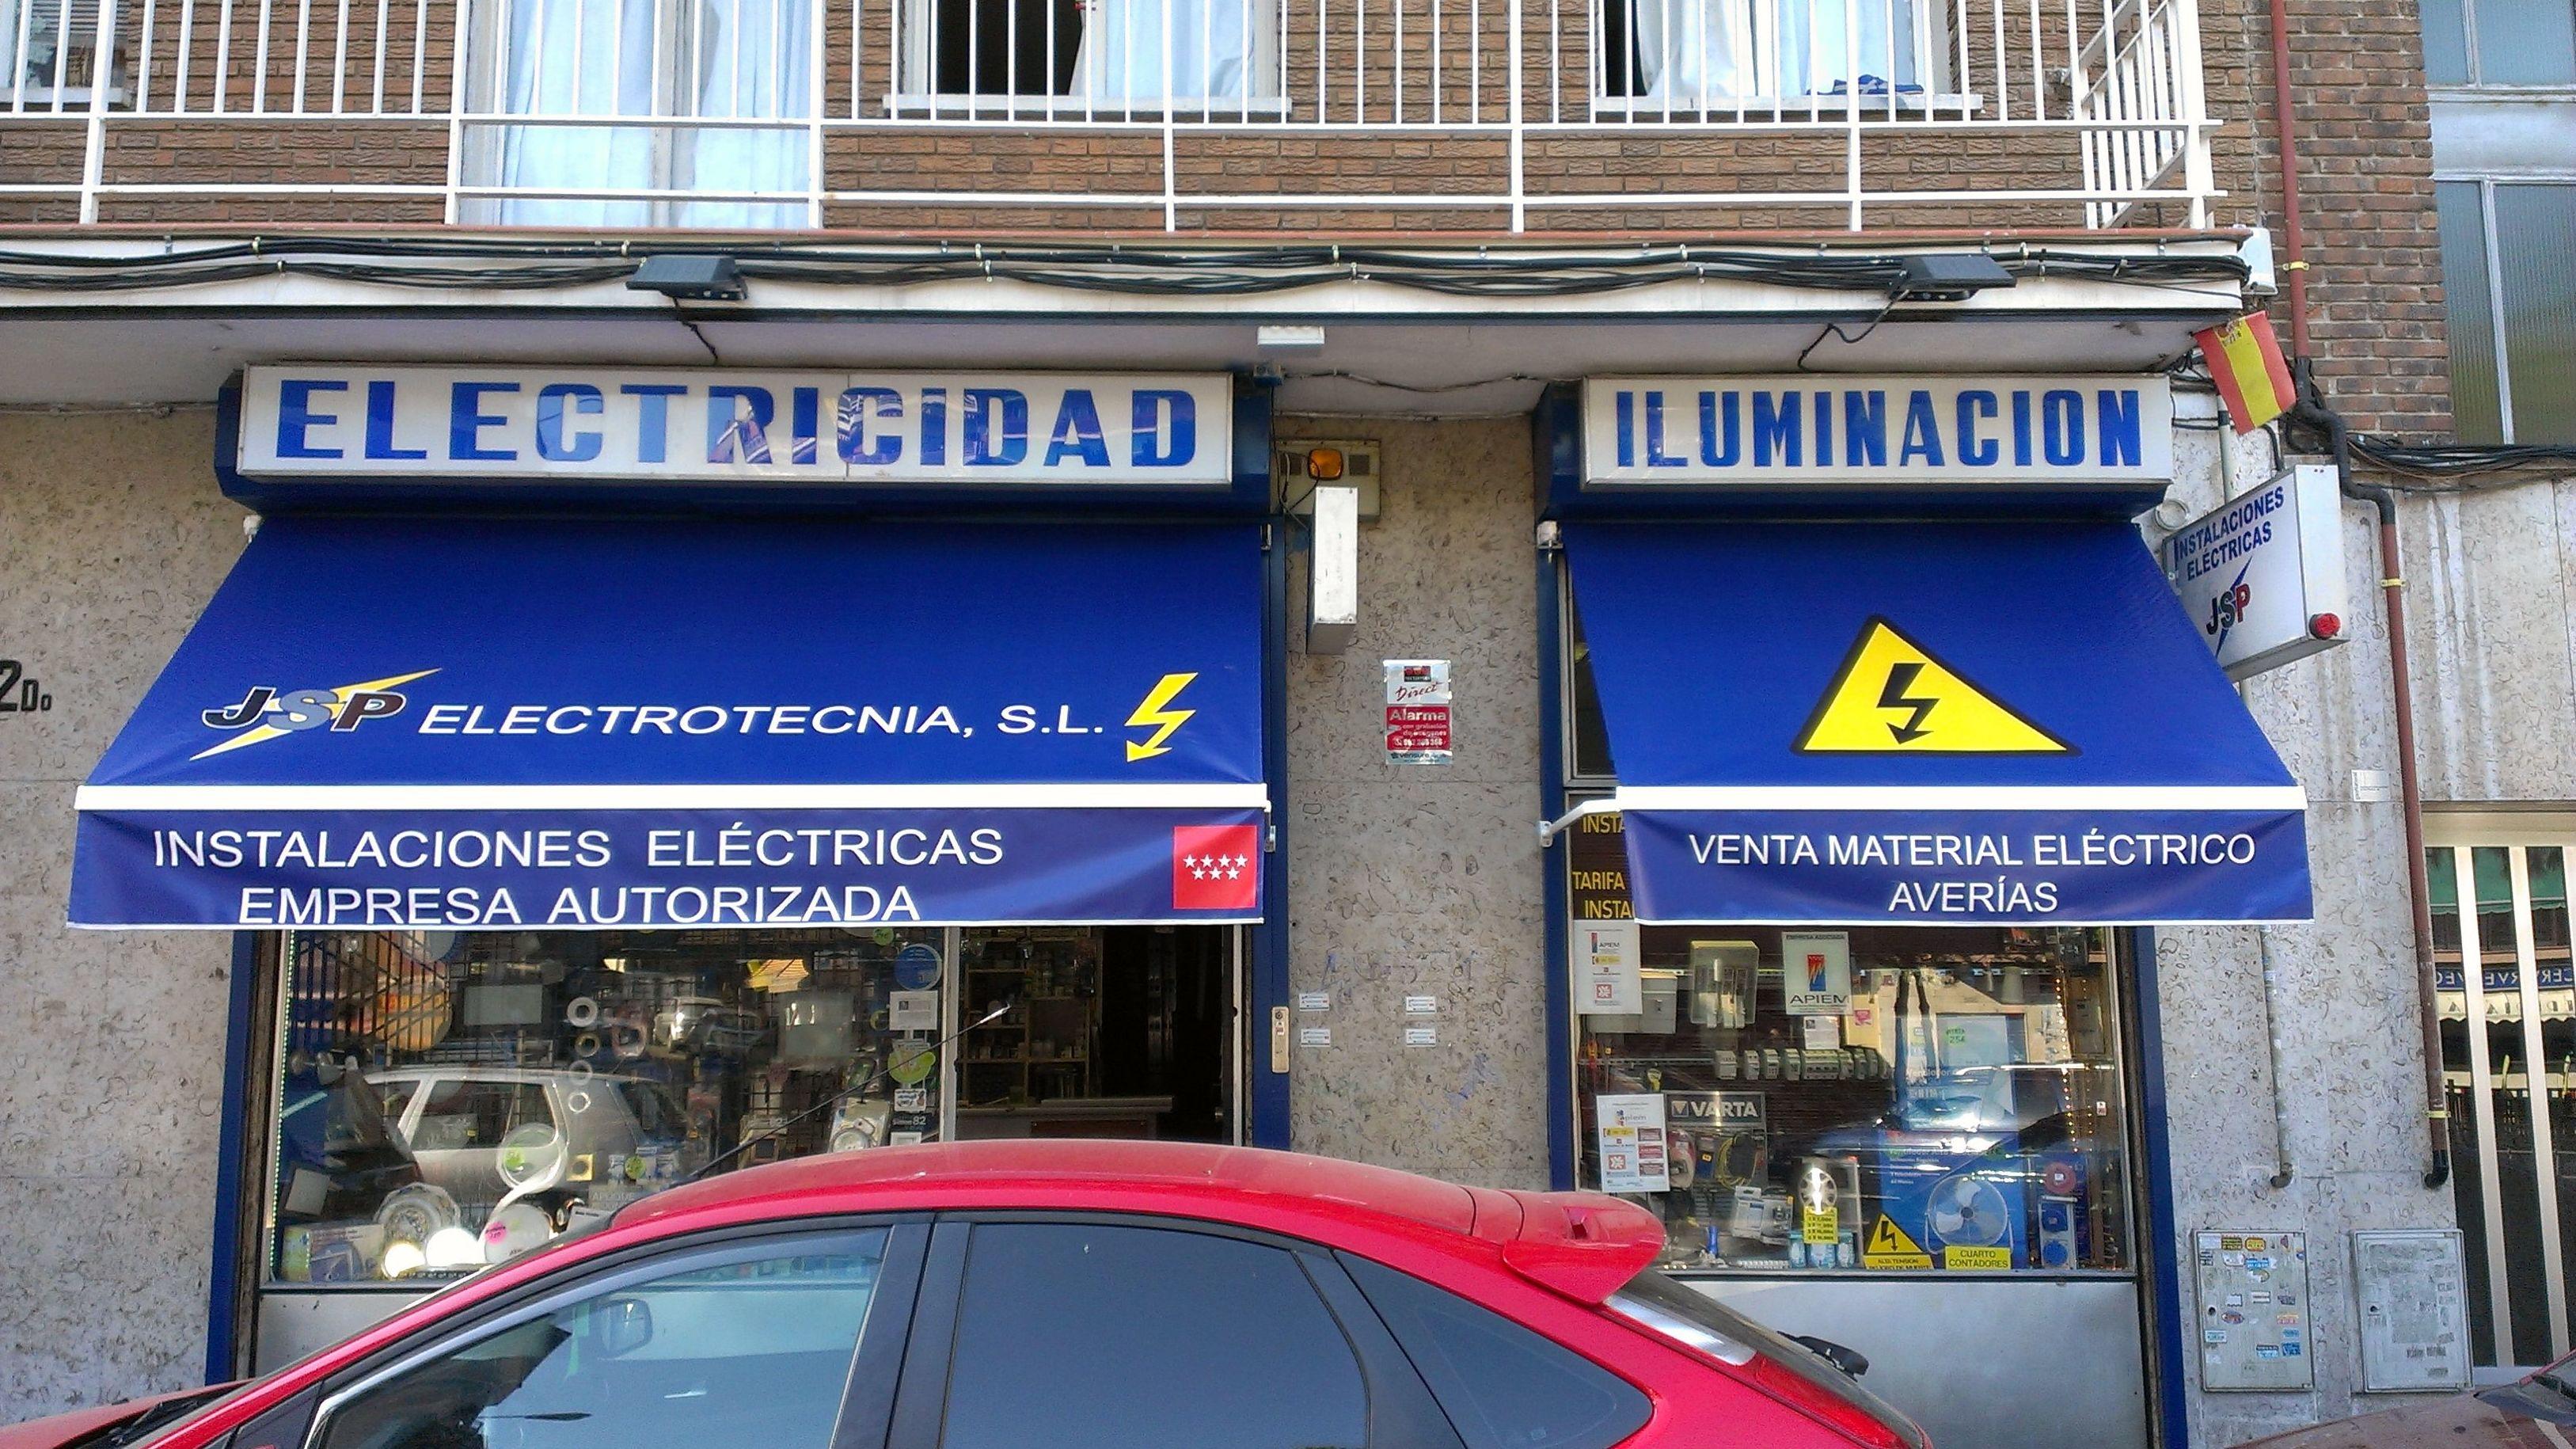 Foto 22 de Electricidad en Madrid | Jsp Electrotecnia, S.L.